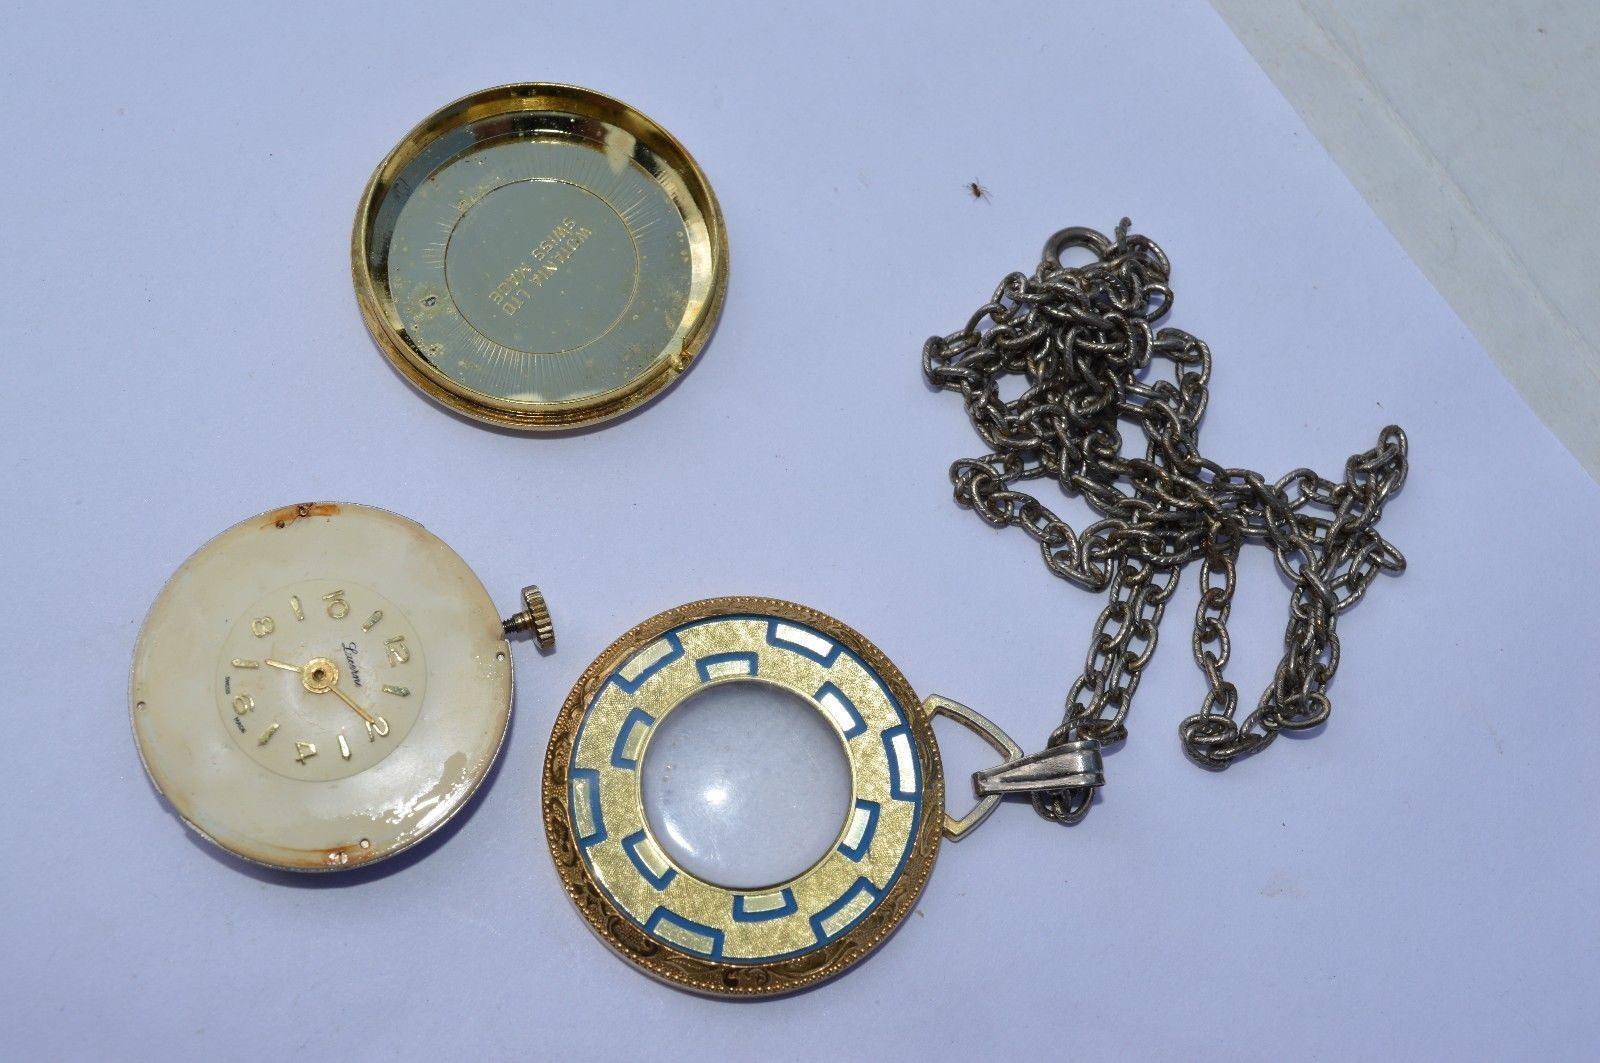 Vintage  LUCERNE  Swiss Pendant watch, Pretty watch, runs but wont set time